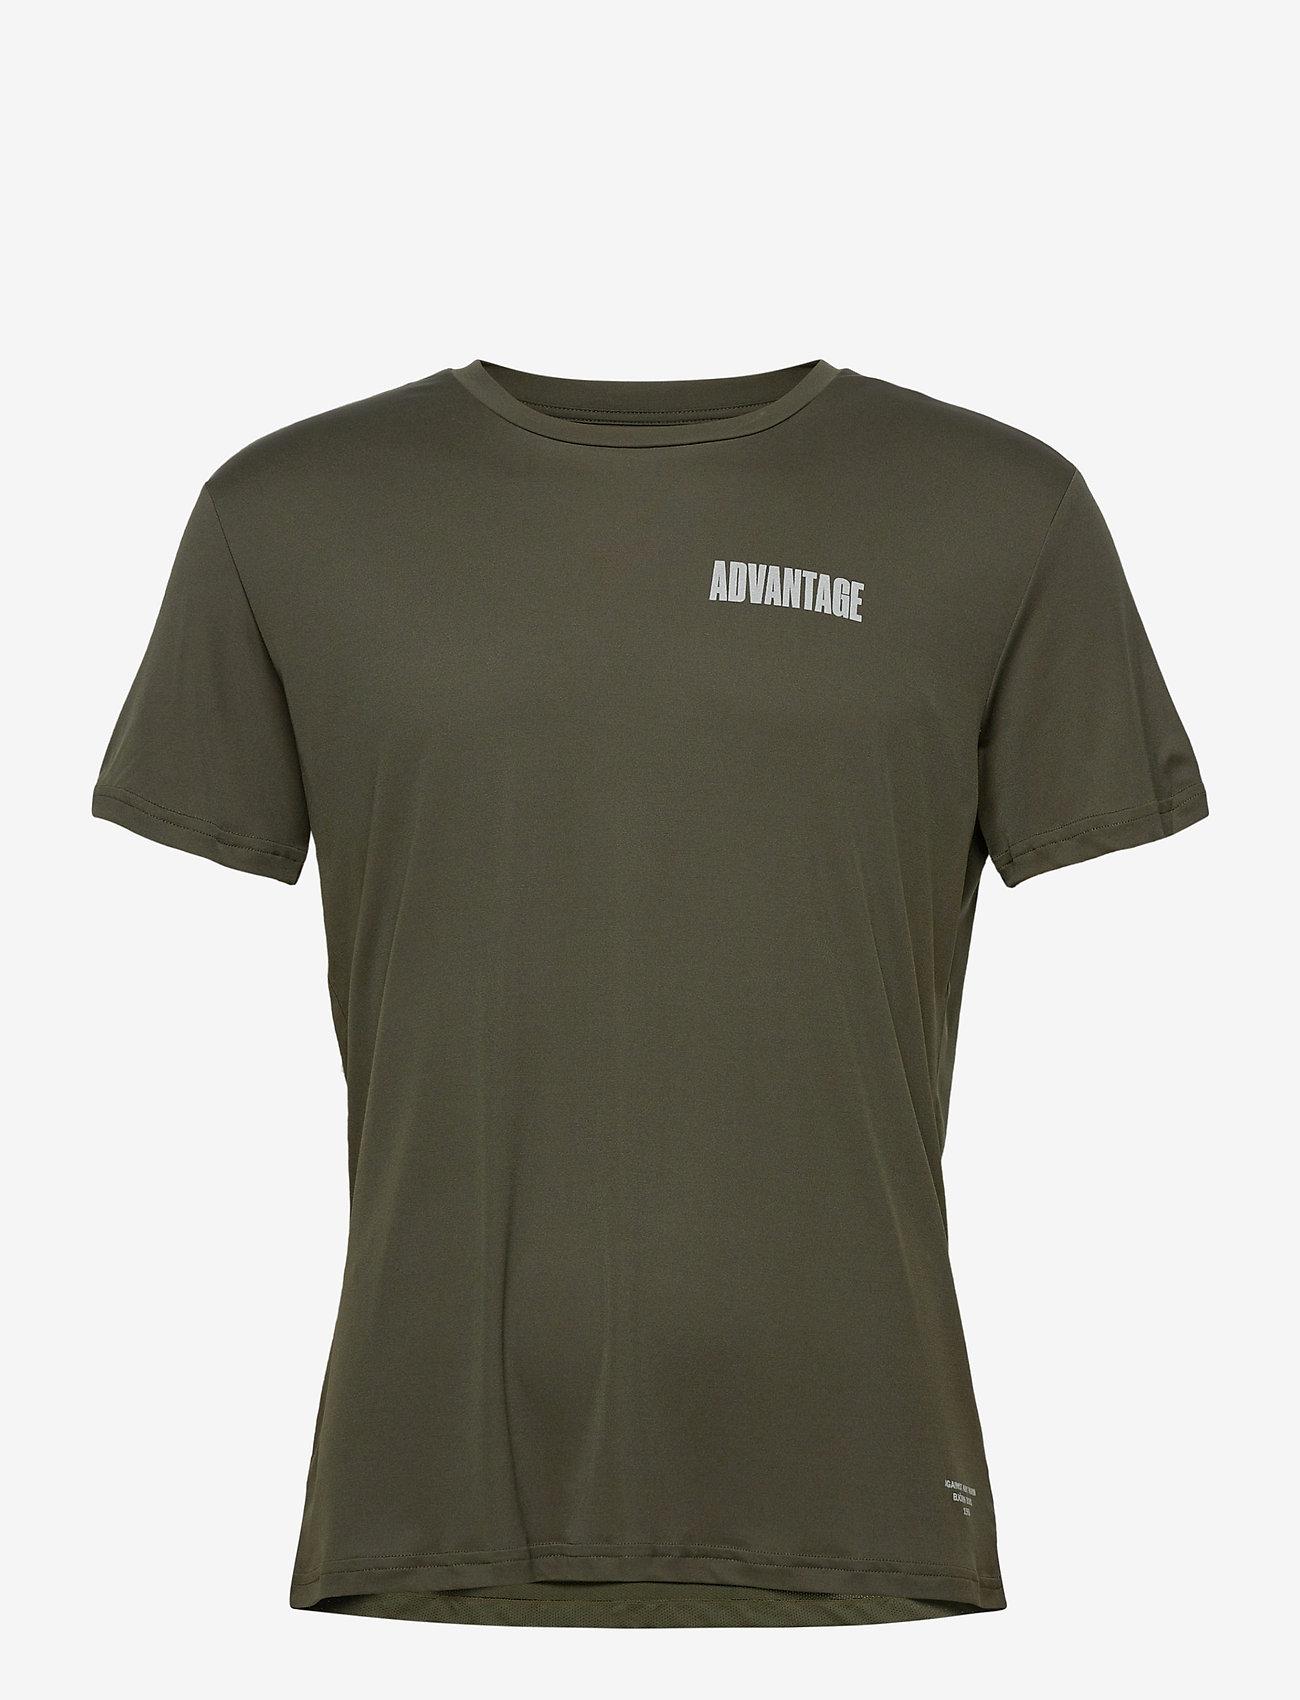 Björn Borg - PERF TEE M NIGHT NIGHT - t-shirts - rosin - 0